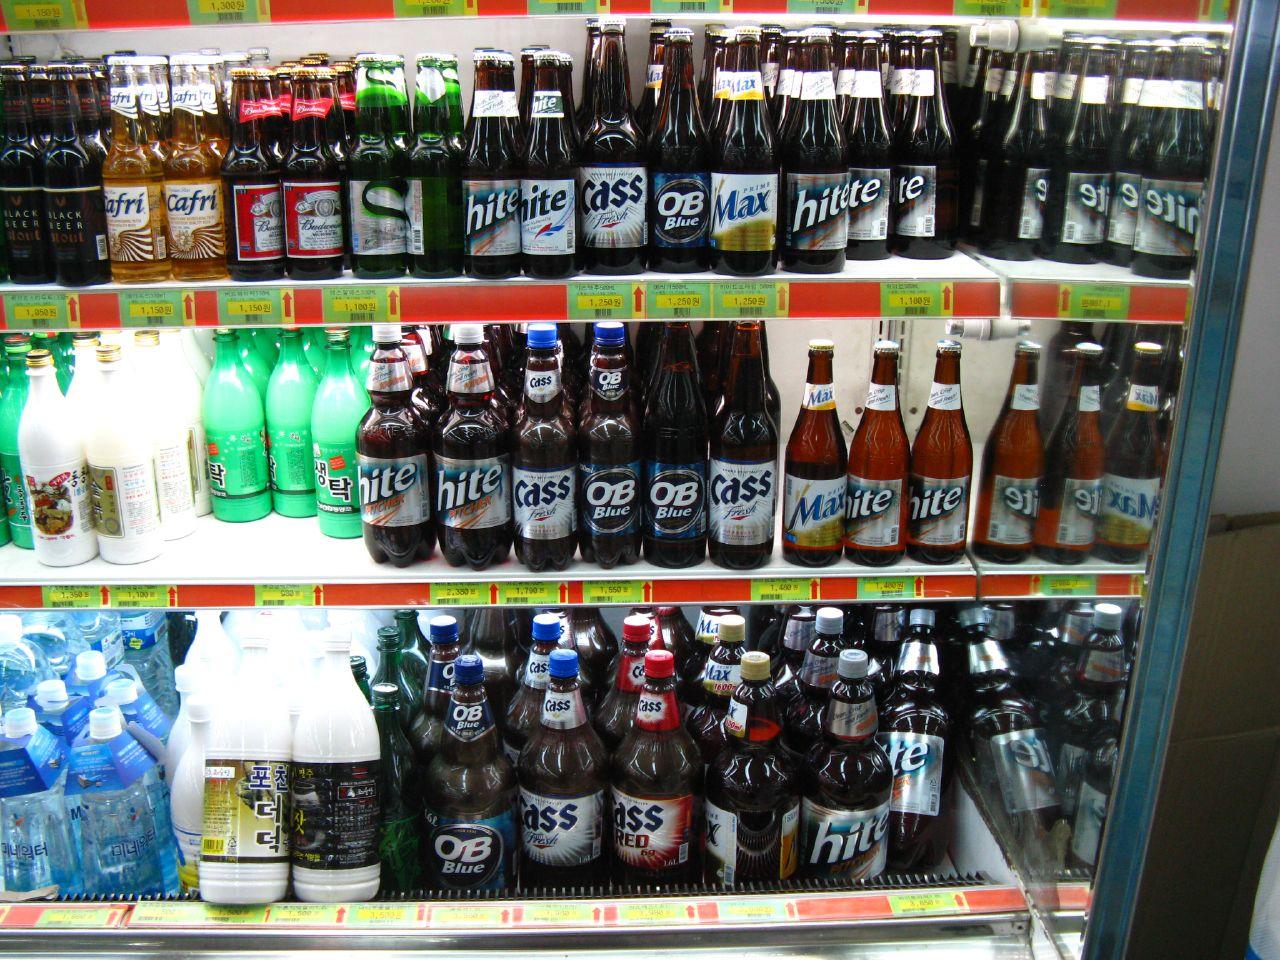 Bulgaria Drink Prices